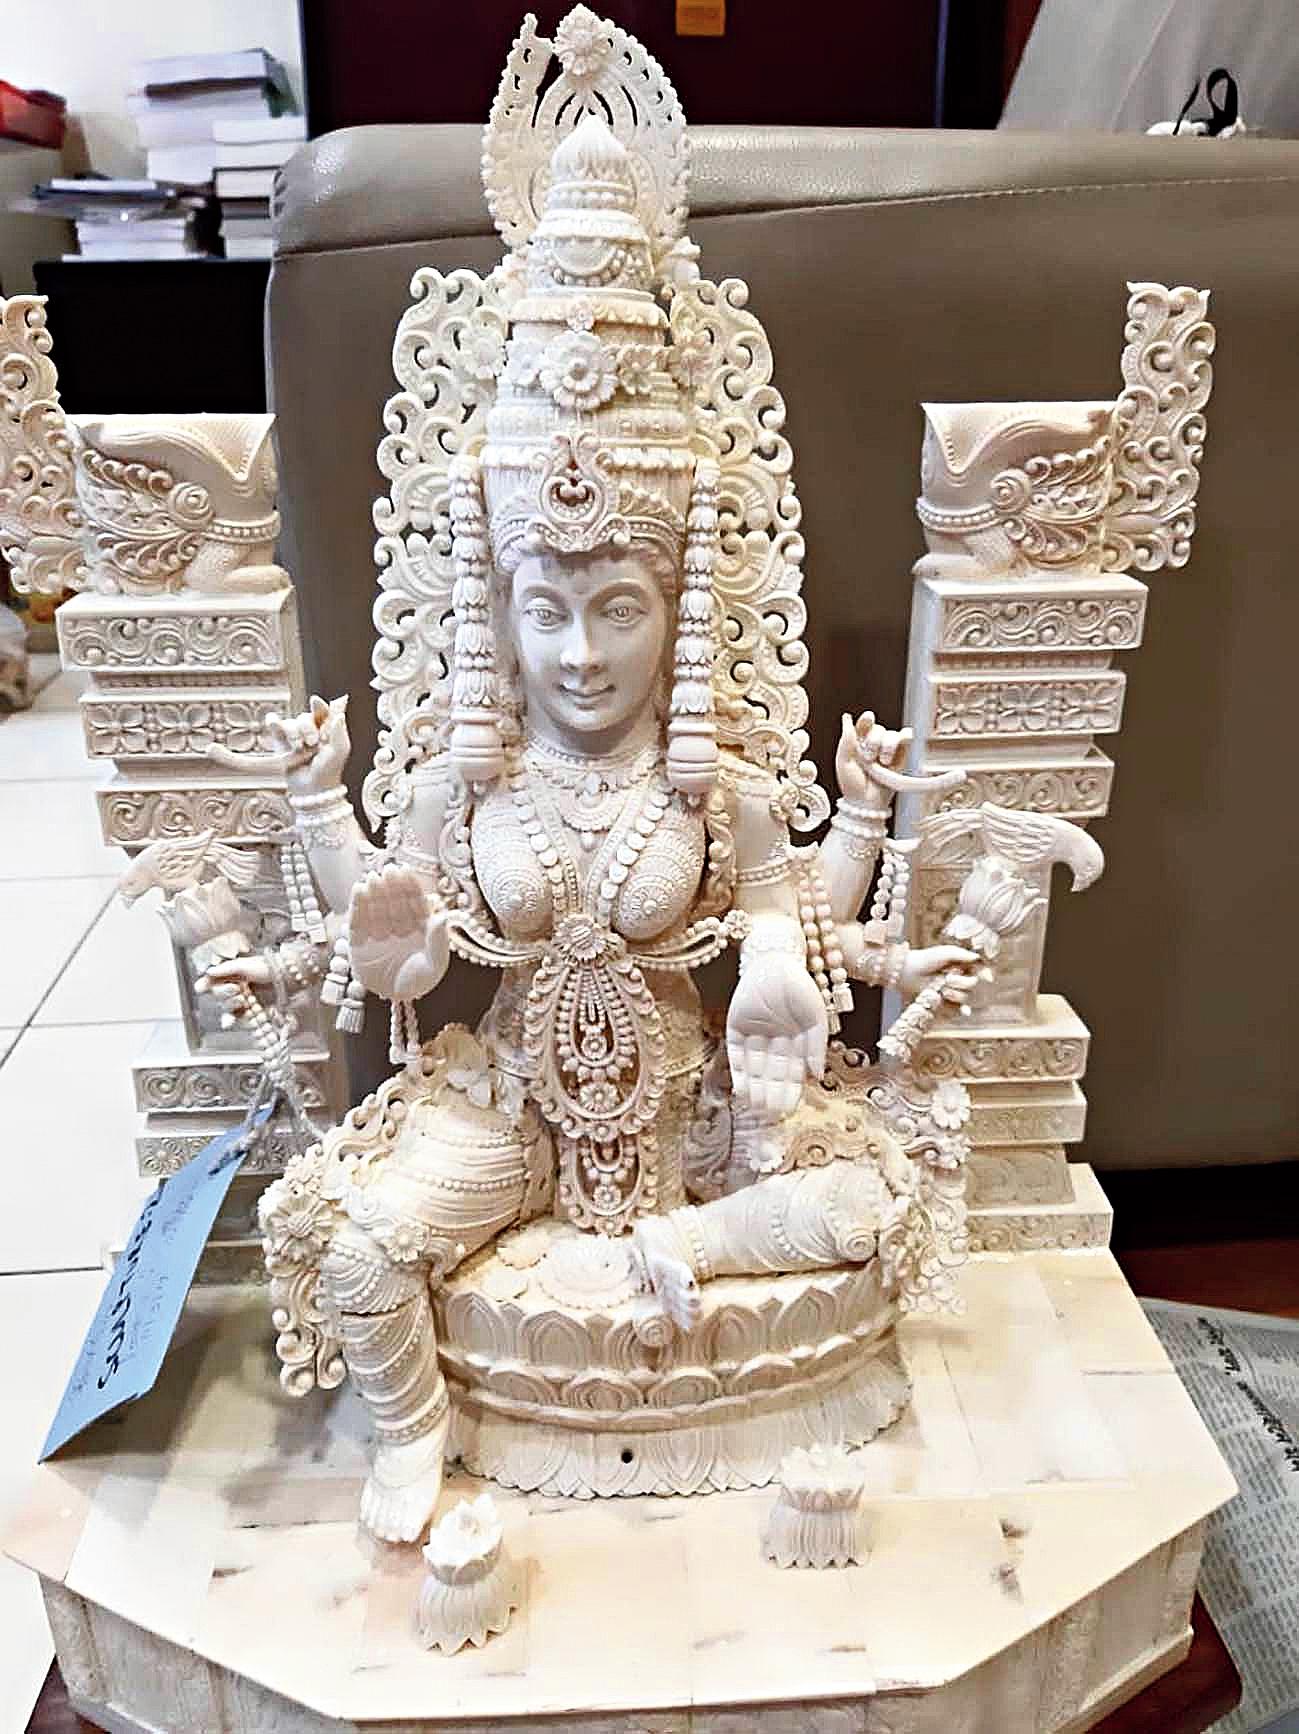 An ivory statuette seized from the Kasba home of Sudheesh Chandra Babu and Amitha SC Babu on Tuesday.